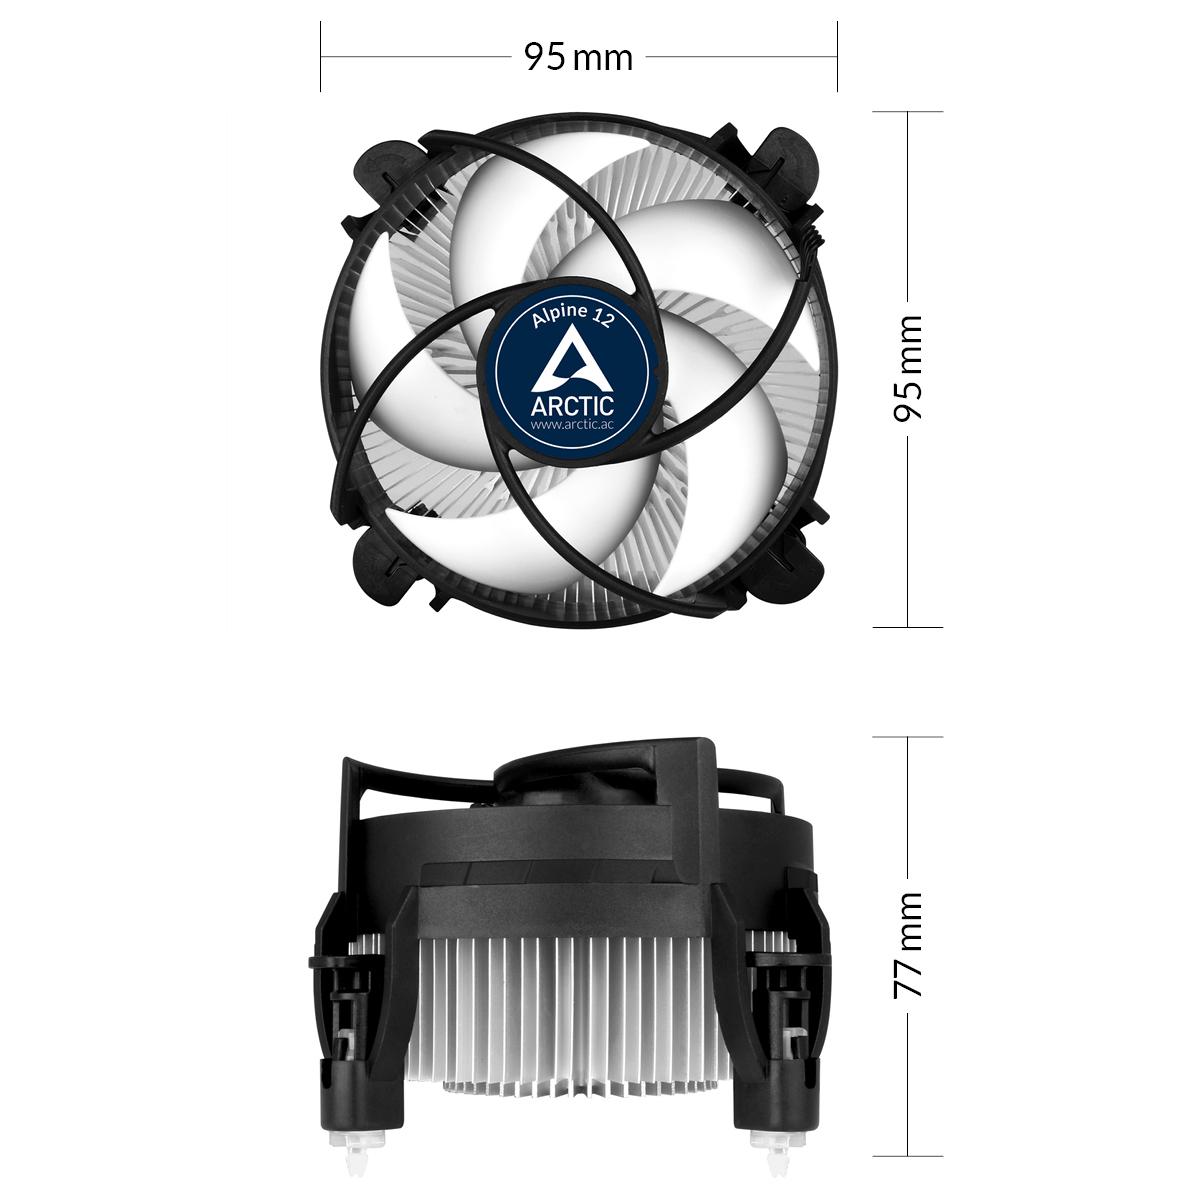 alpine-12-dimensions